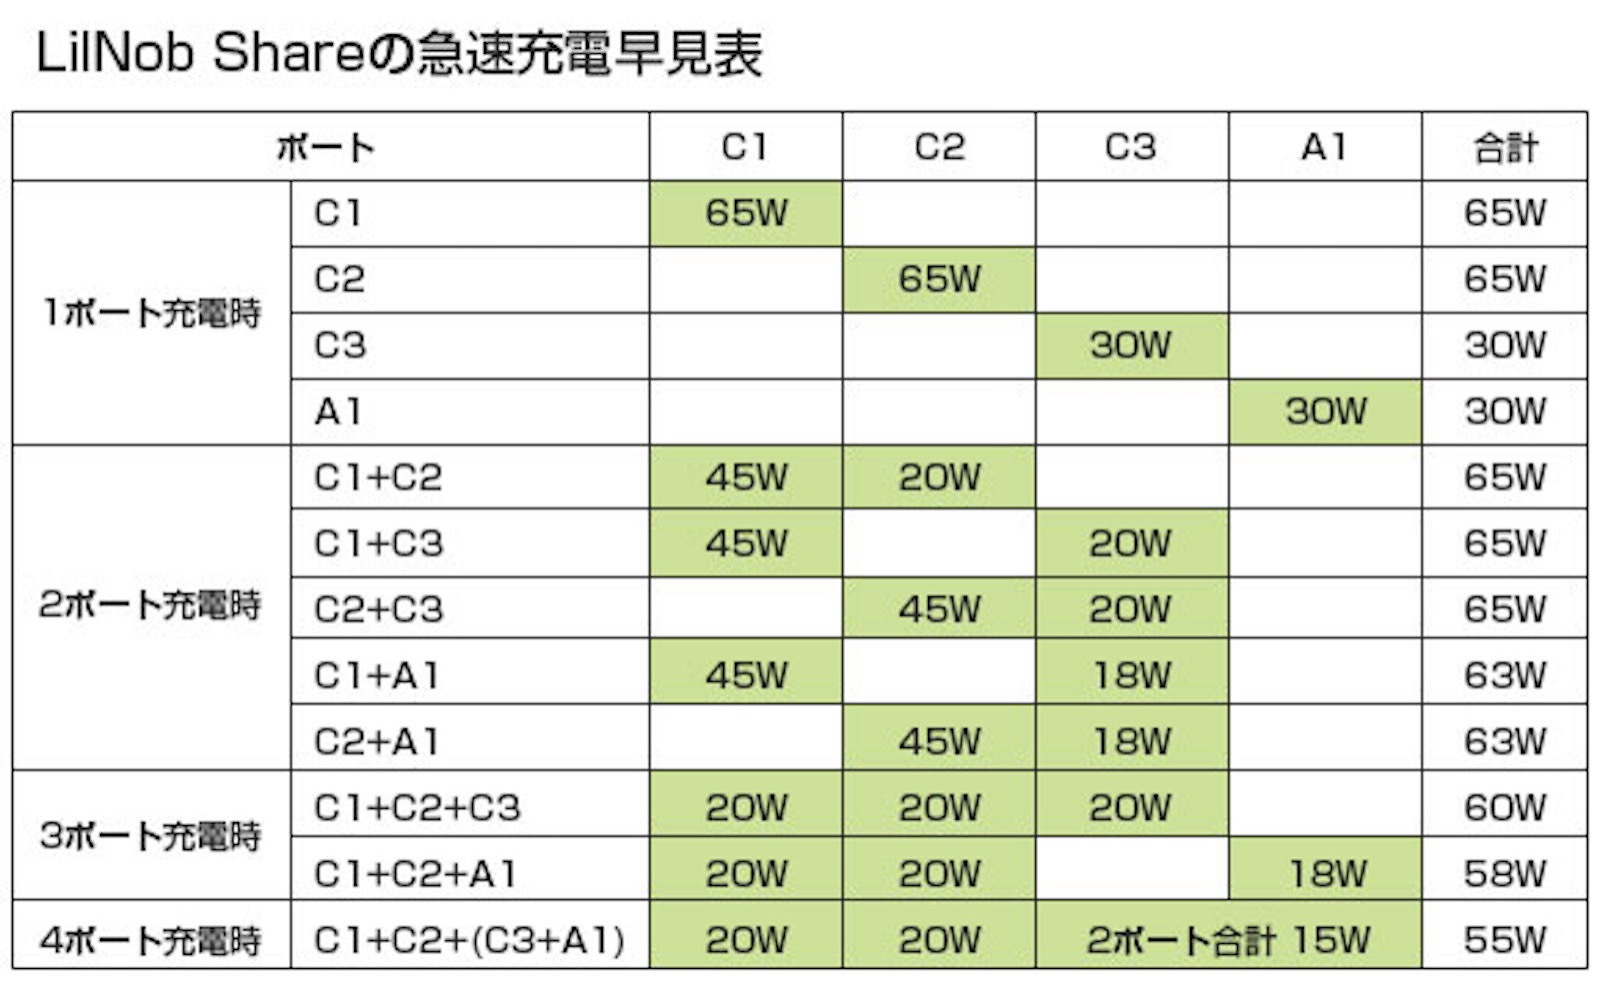 LilNob Share GaN 65W charger 3